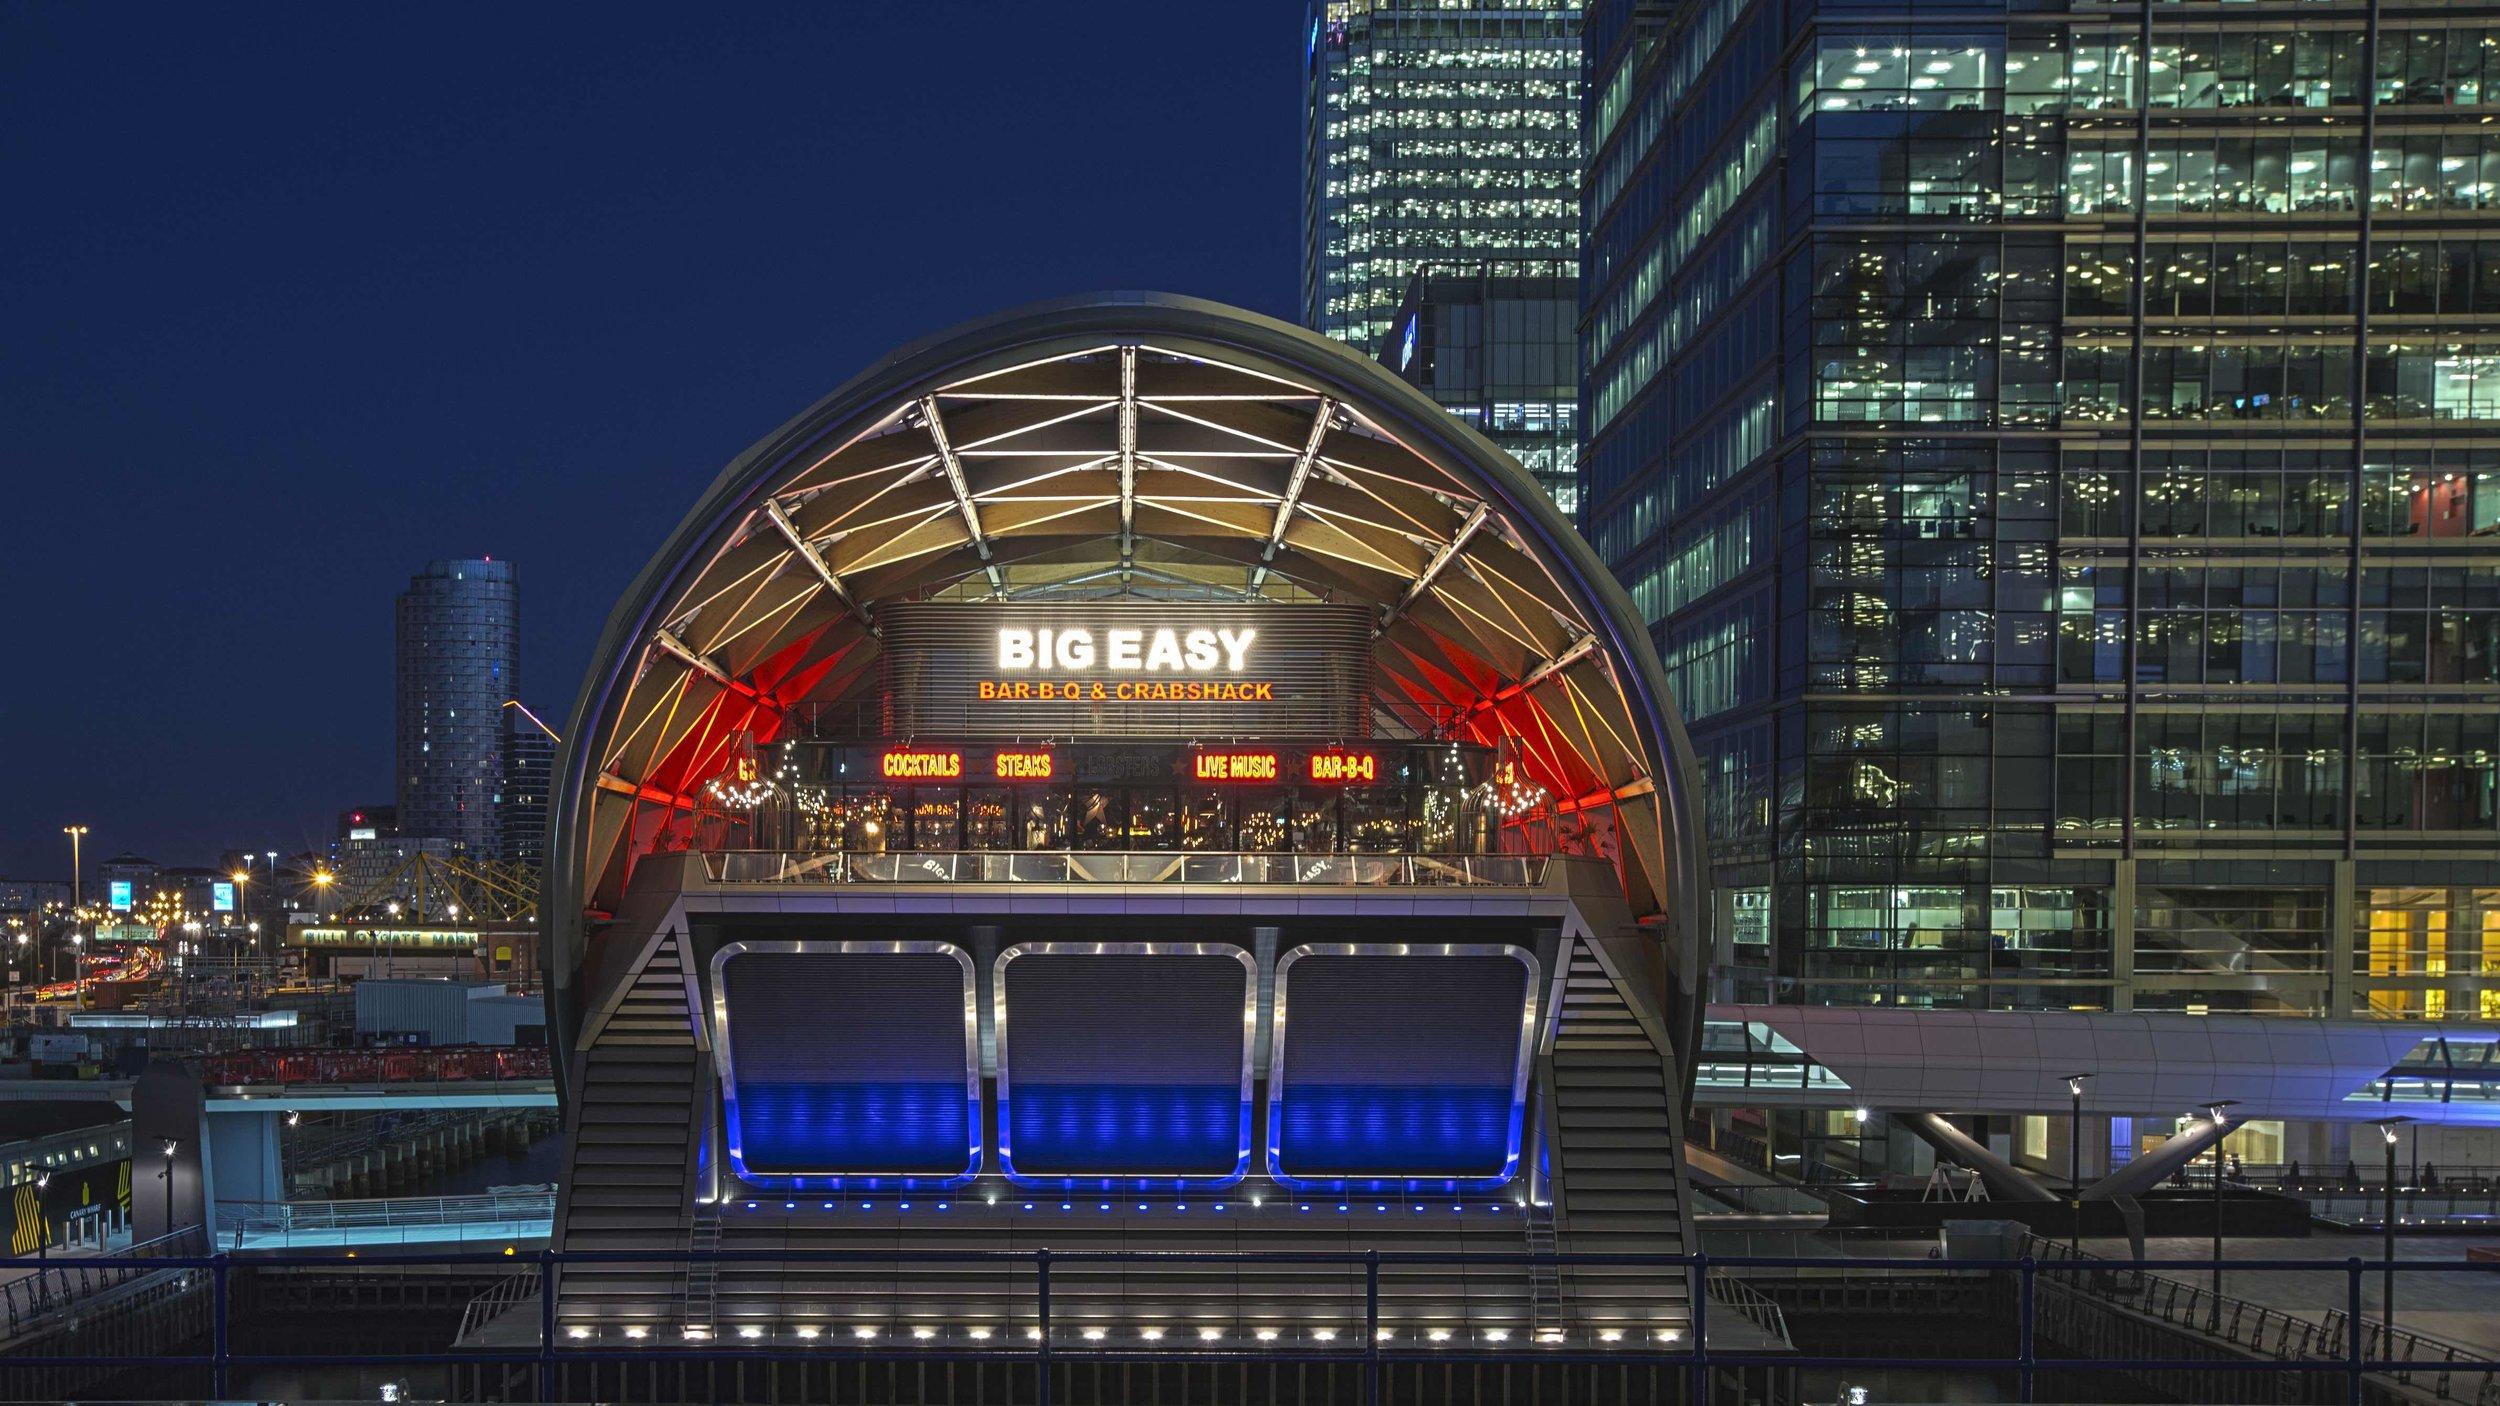 fabio_burrelli_street_photography_architecture_london_canary_wharf-2.jpg